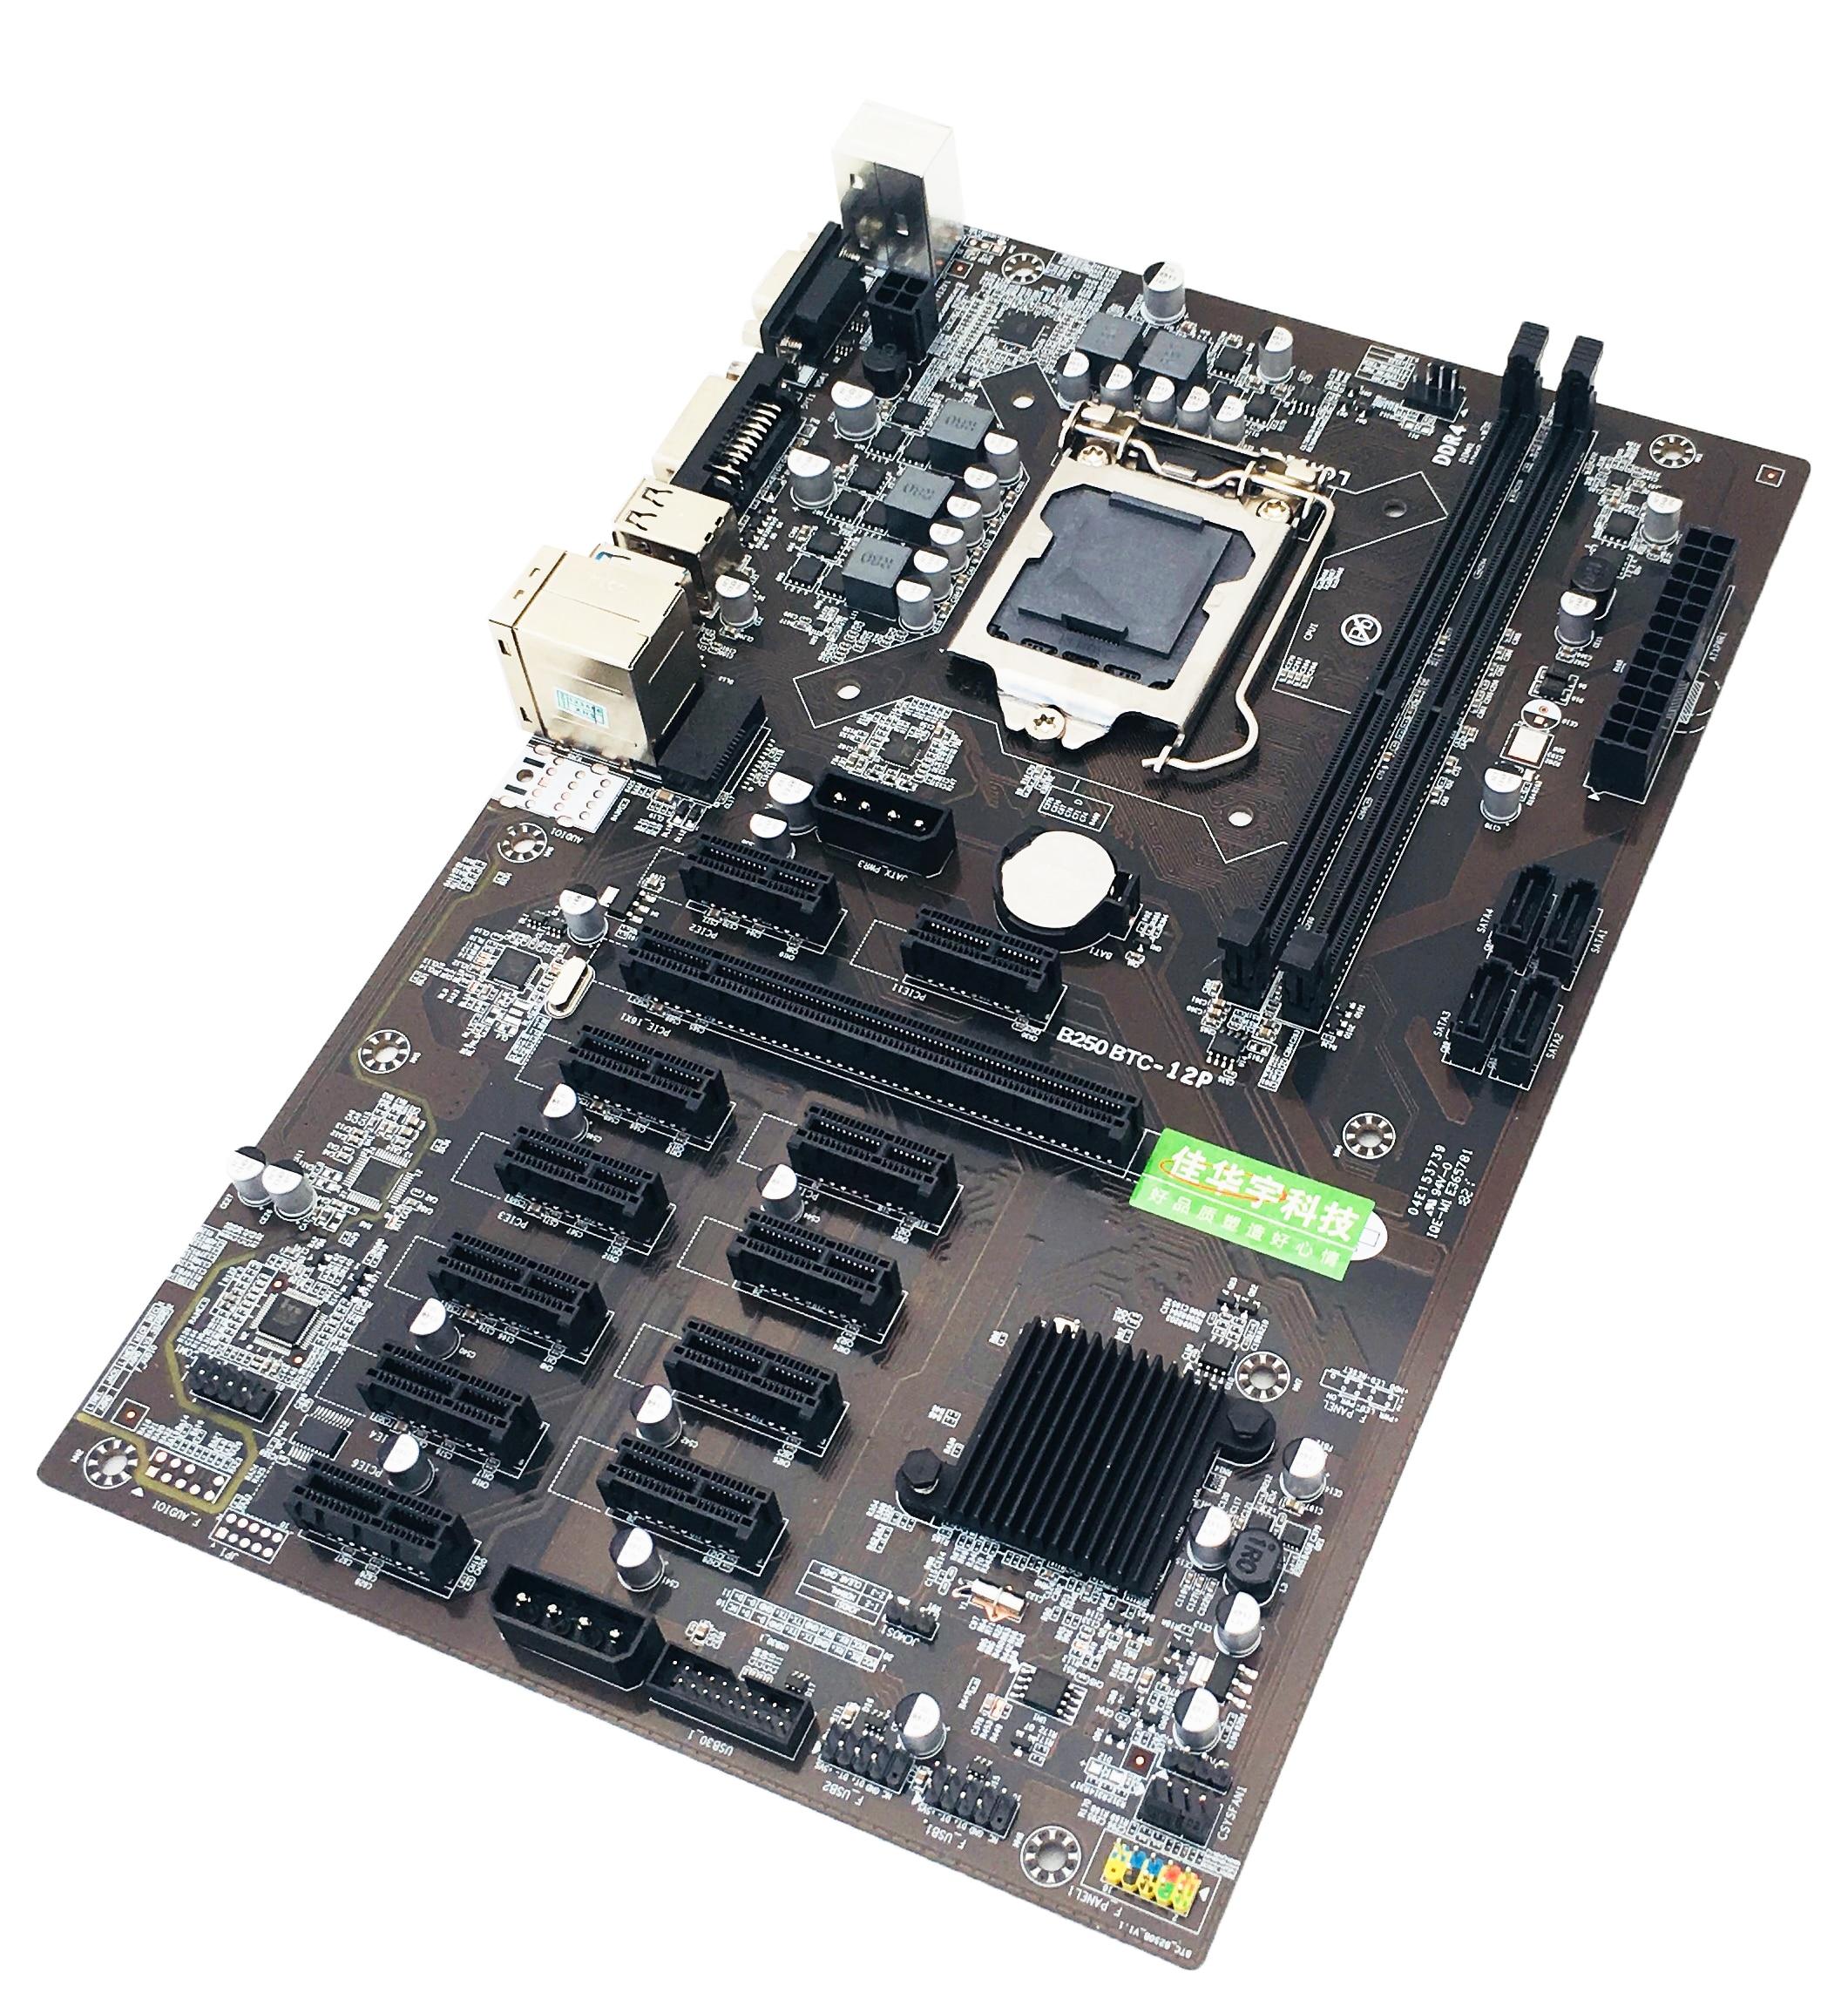 New B250 BTC  Mining Machine Motherboard 12 16X Graph Card SODIMM DDR4  SATA3.0 Support VGA Compatible A08 21 Dropship